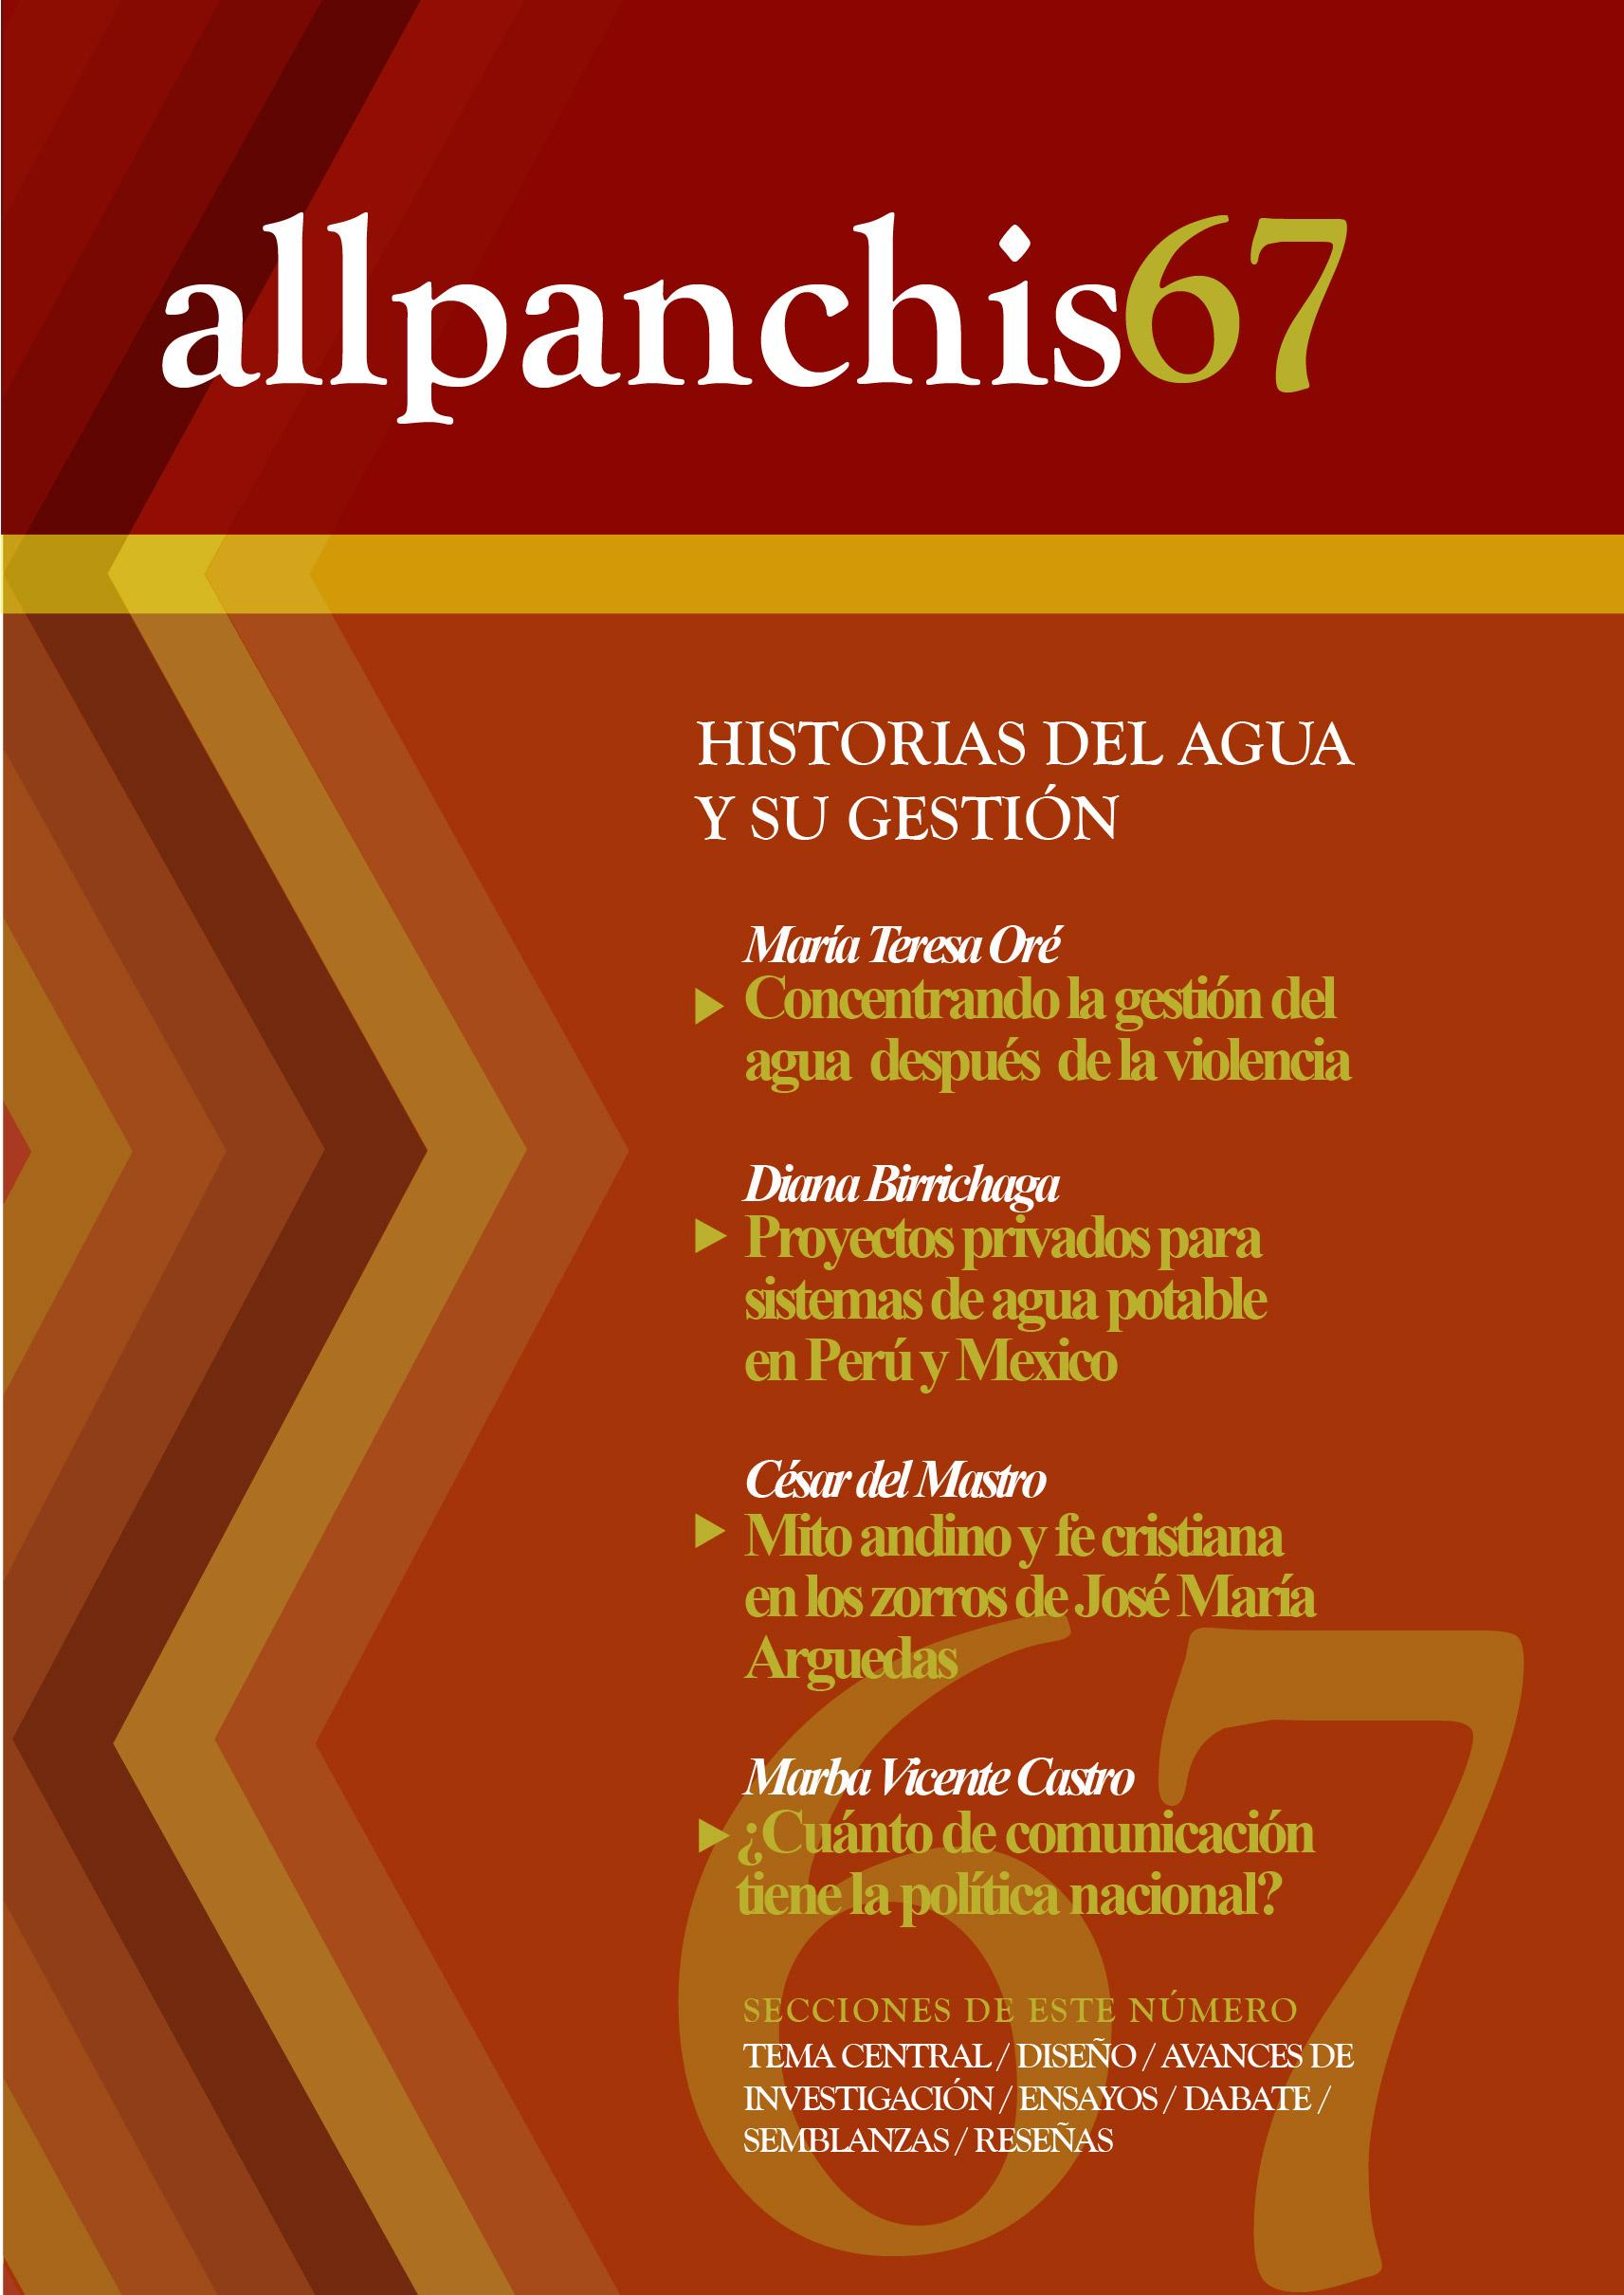 Allpanchis 67